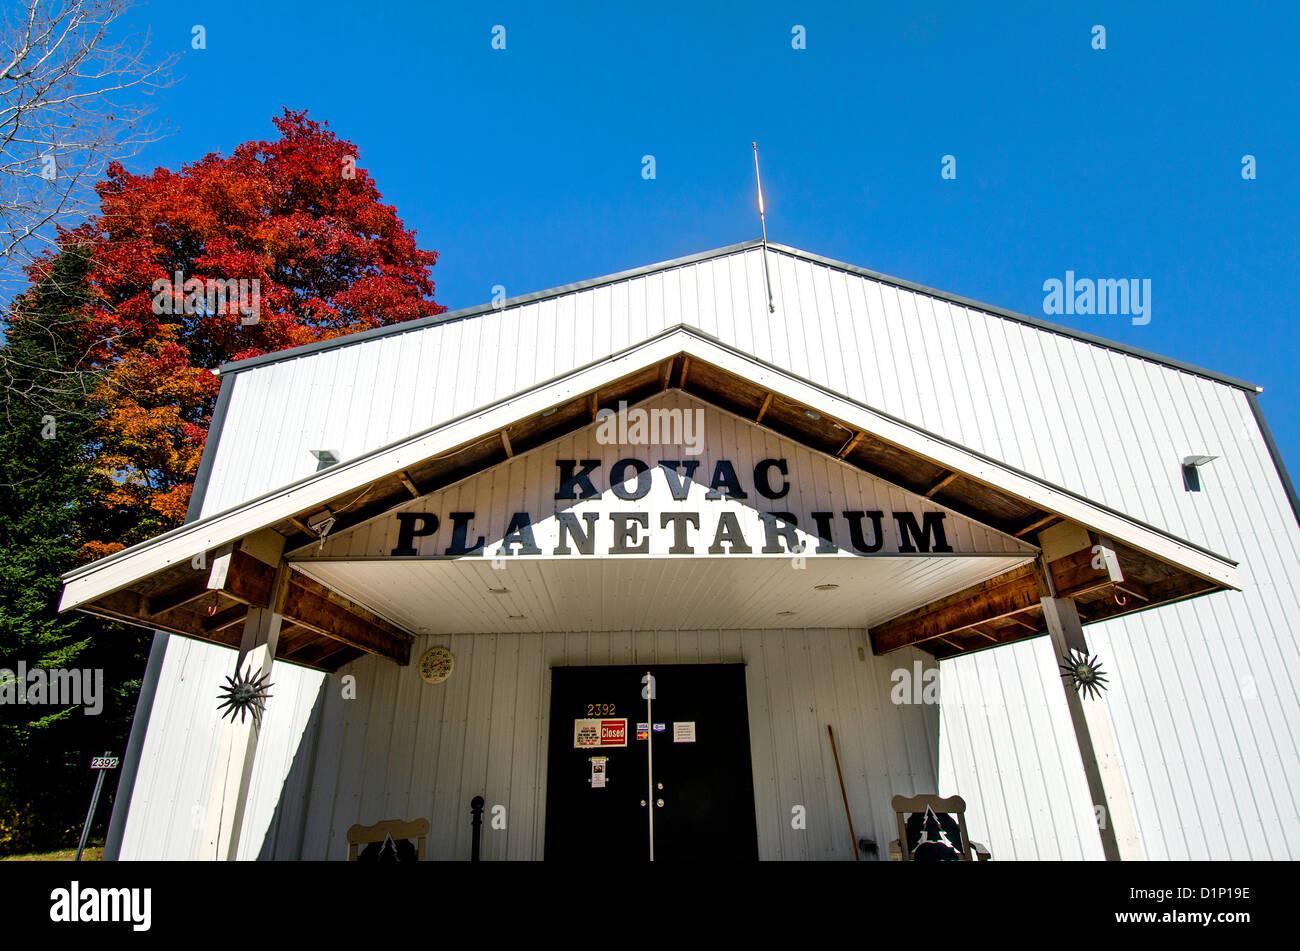 Kovac Planetarium Rhinelander Wisconsin WI - Stock Image